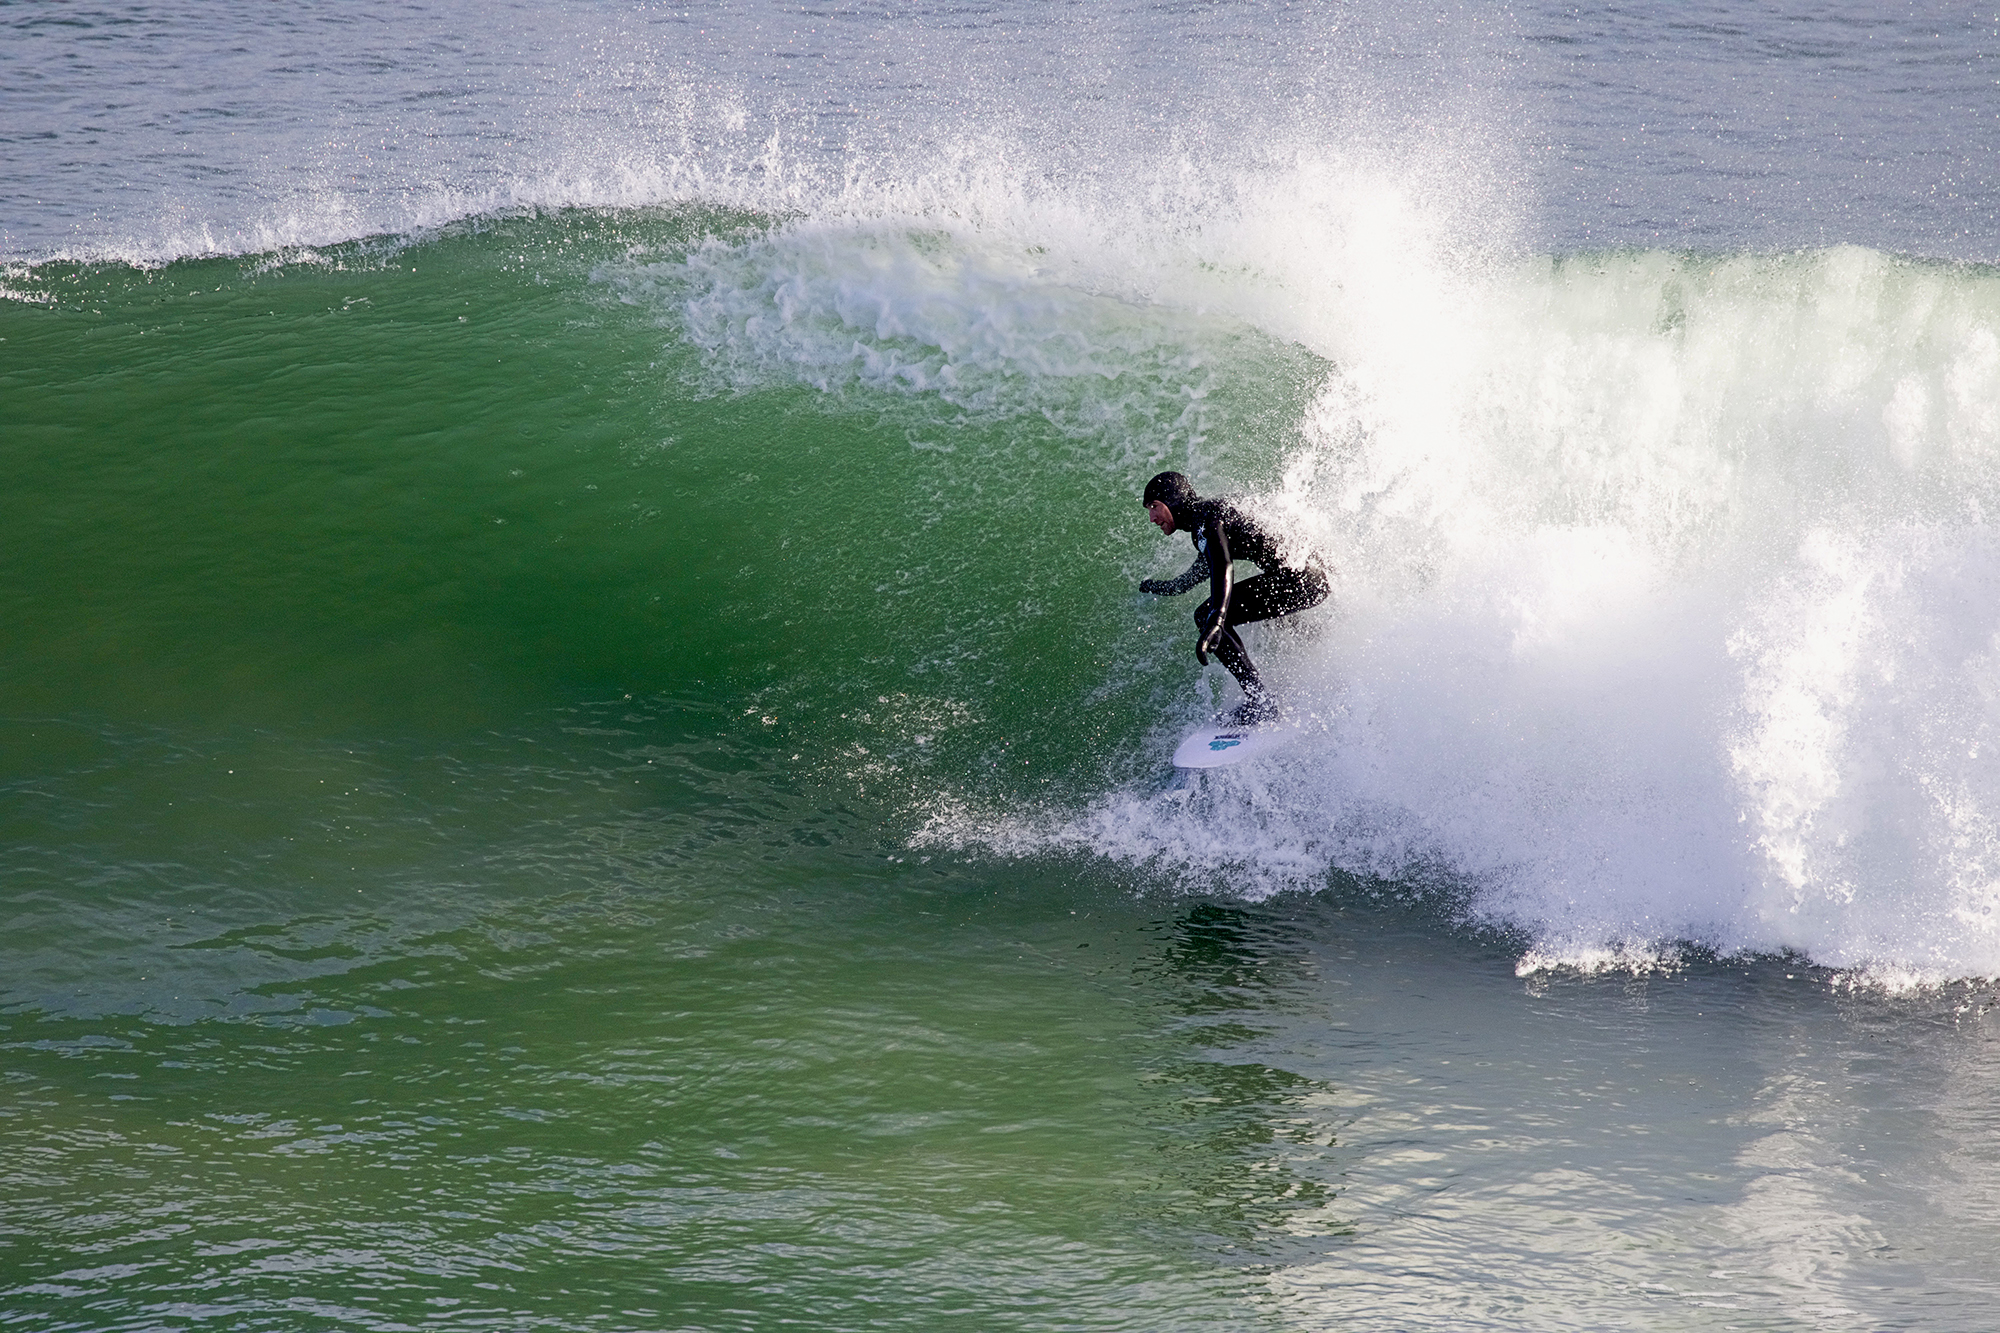 1-19-17 MTK Surfer 22.jpg